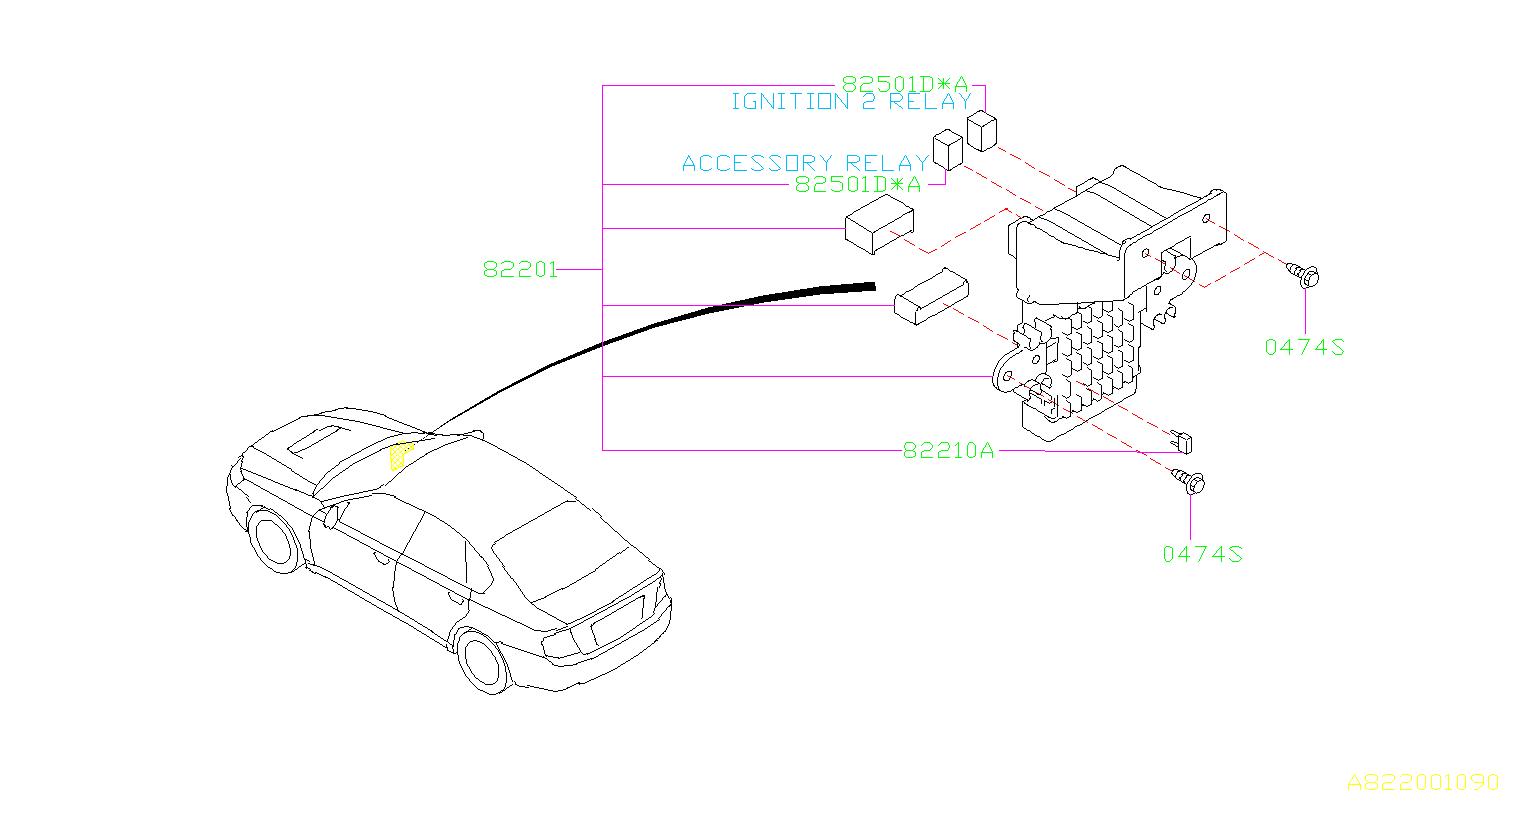 Subaru Legacy Accessory Power Relay Box Fuse Main